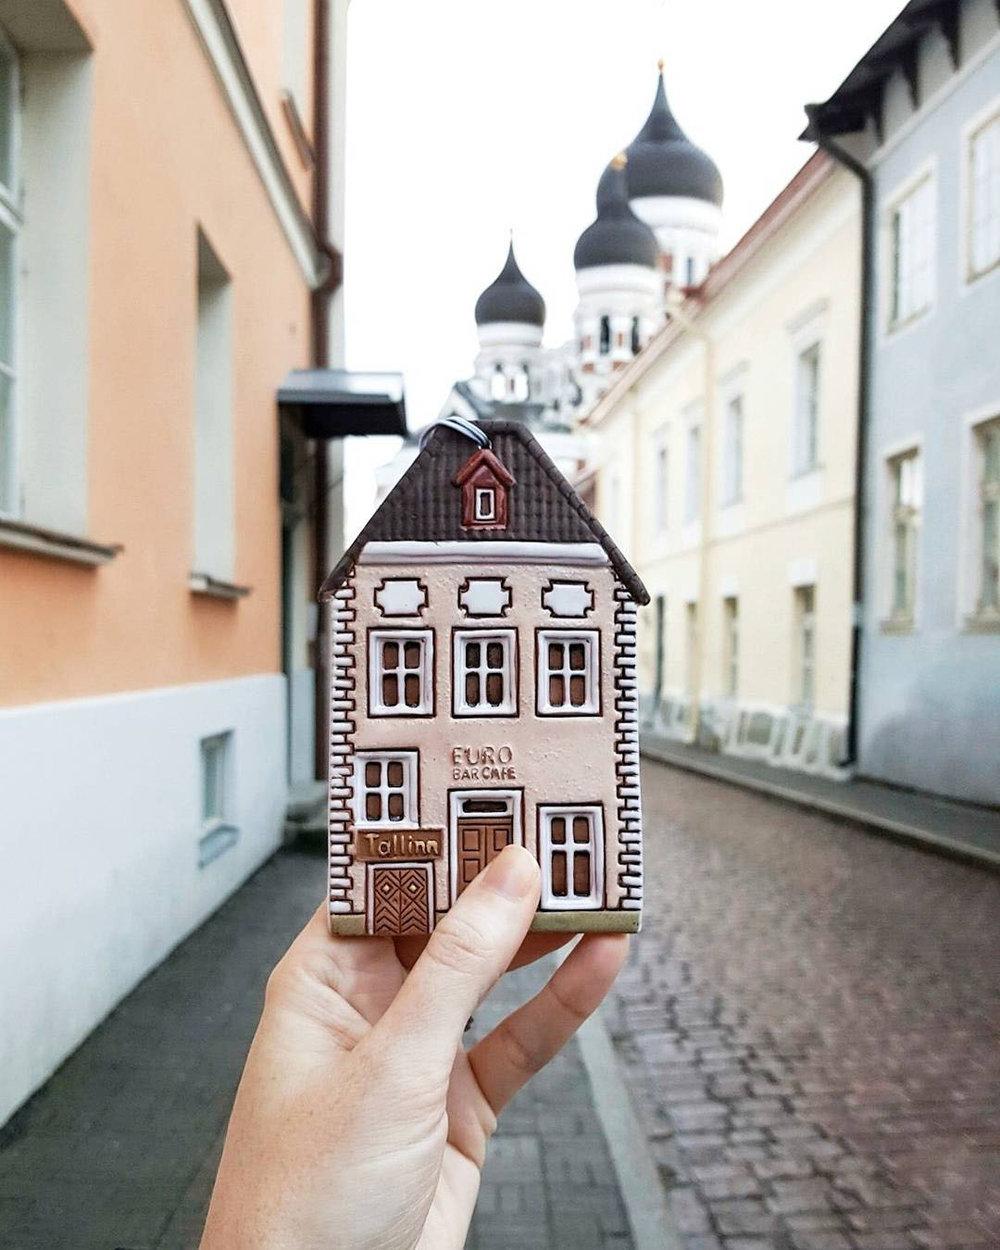 Tallinn's Old Town is like one big Gingerbread village